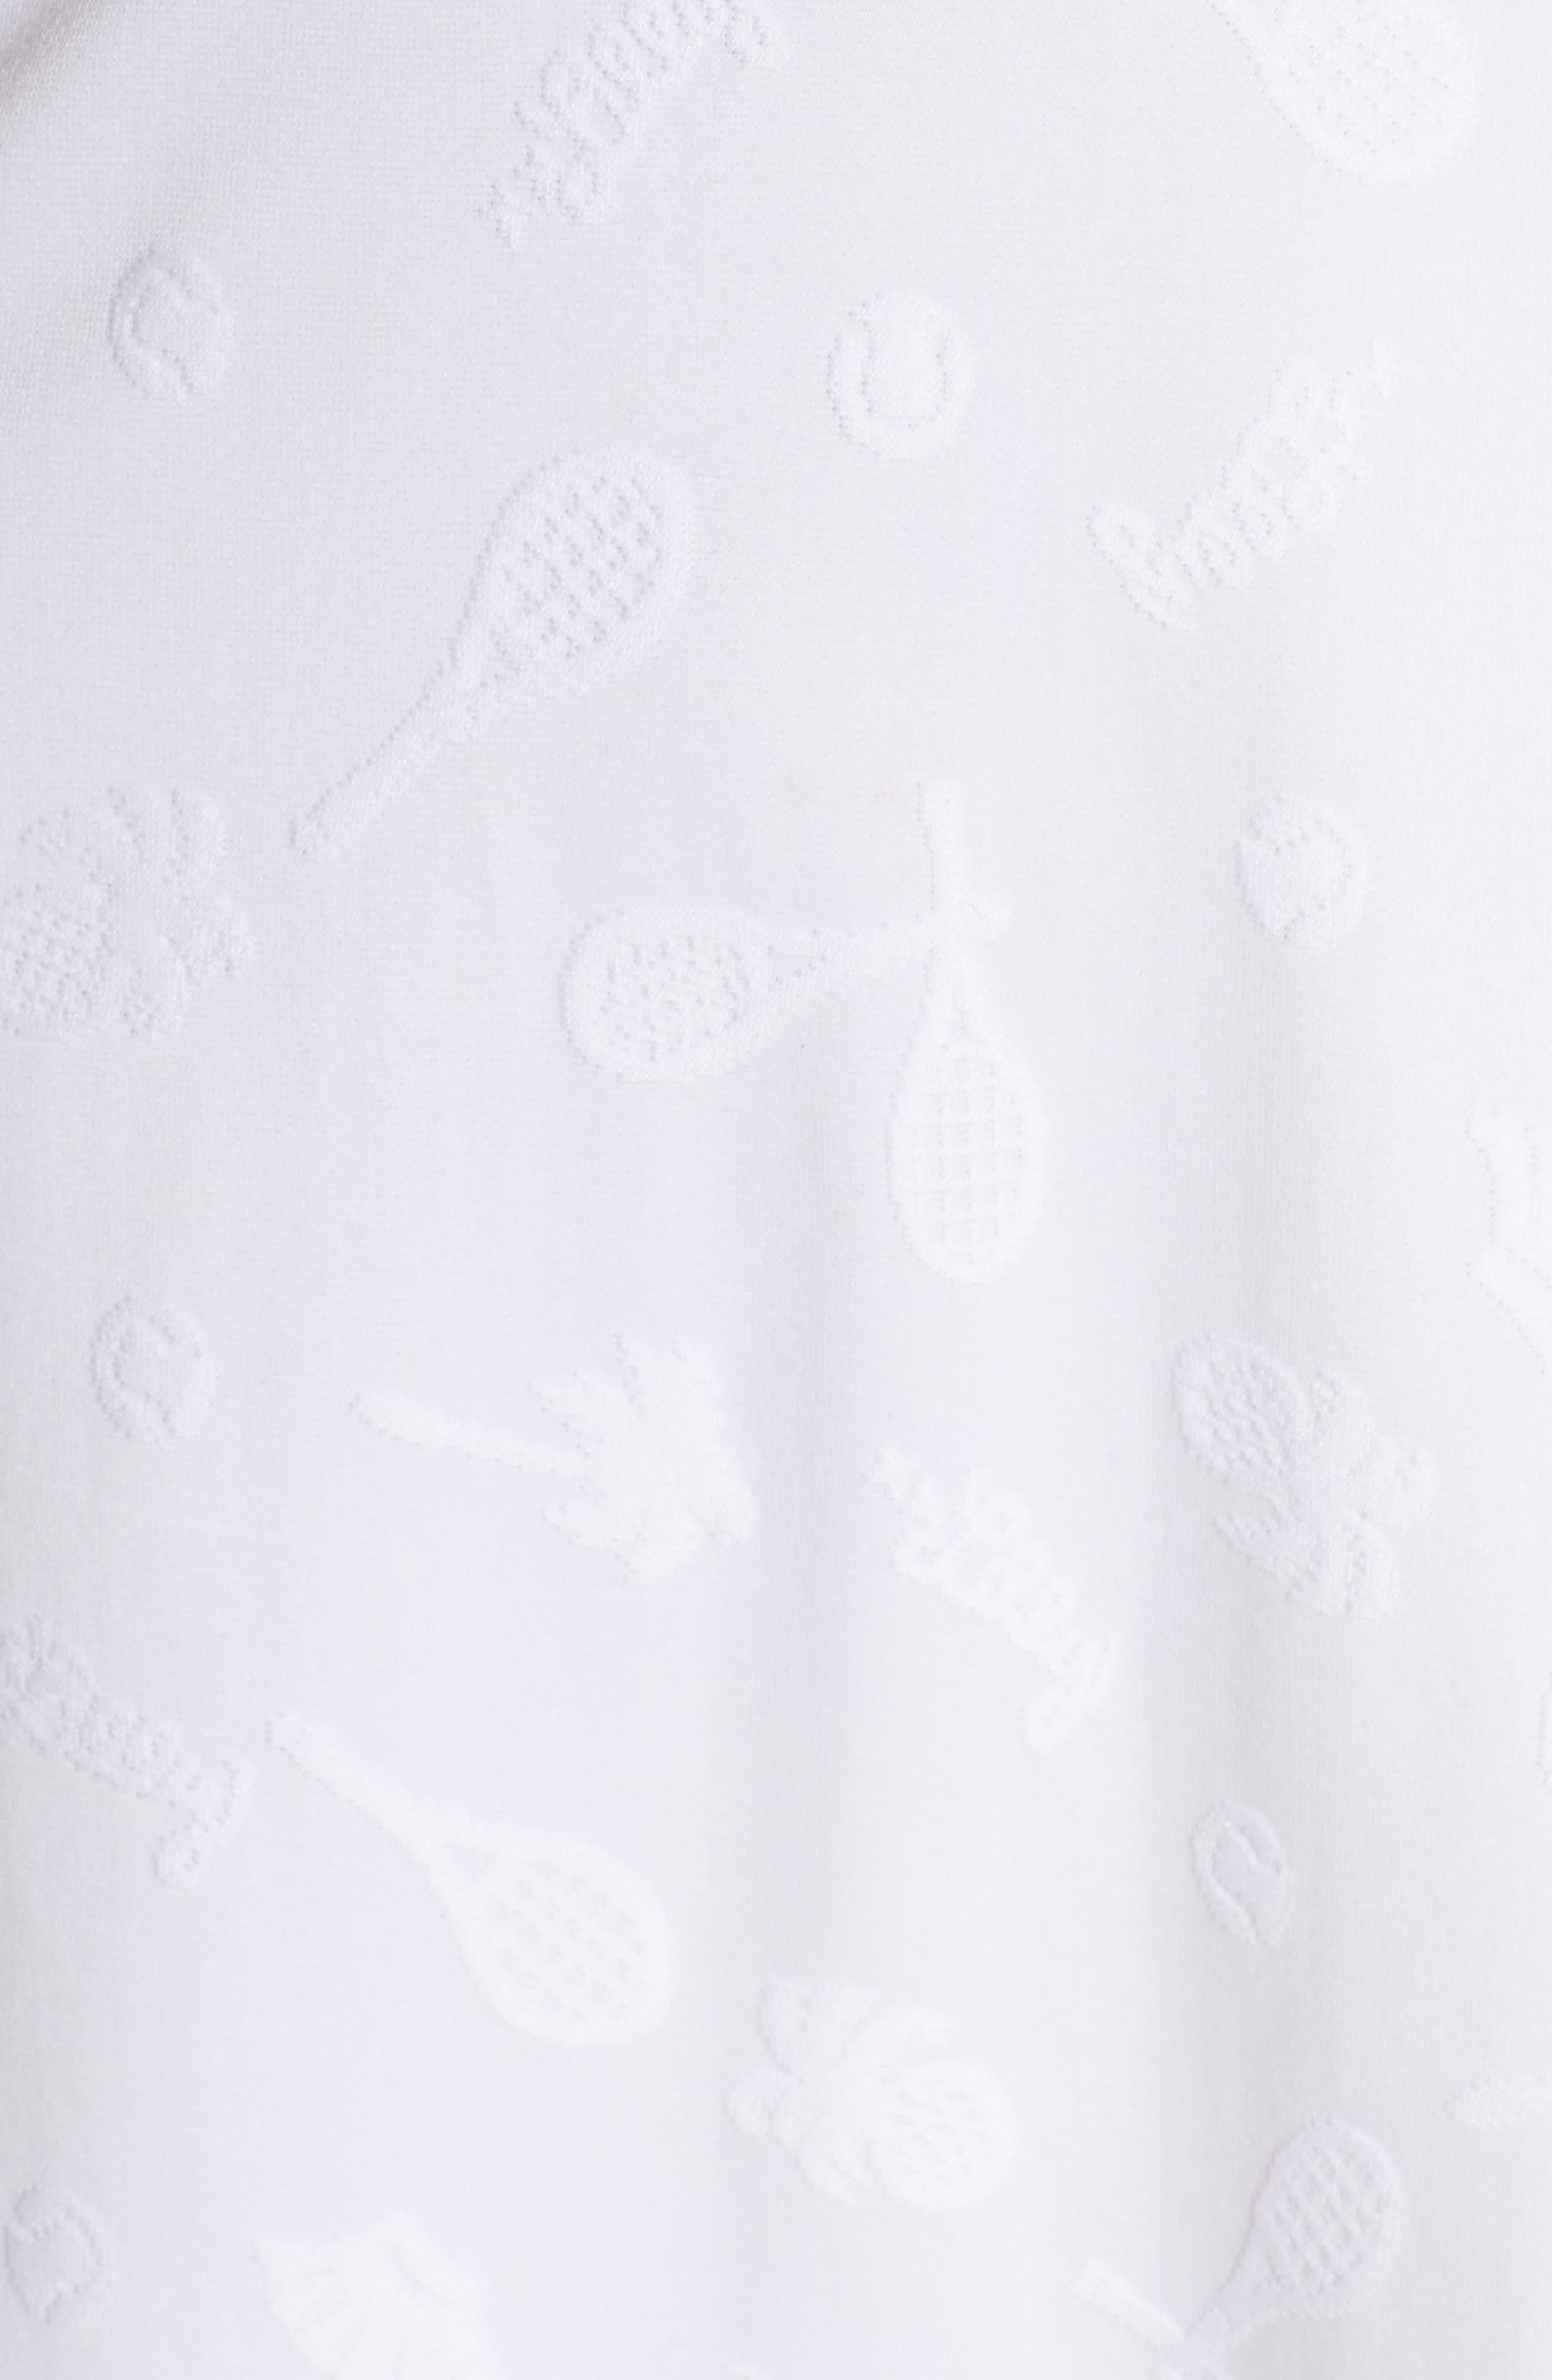 Delphina UPF 50+ Tennis Dress,                             Alternate thumbnail 6, color,                             Resort White Perfect Match Jaq